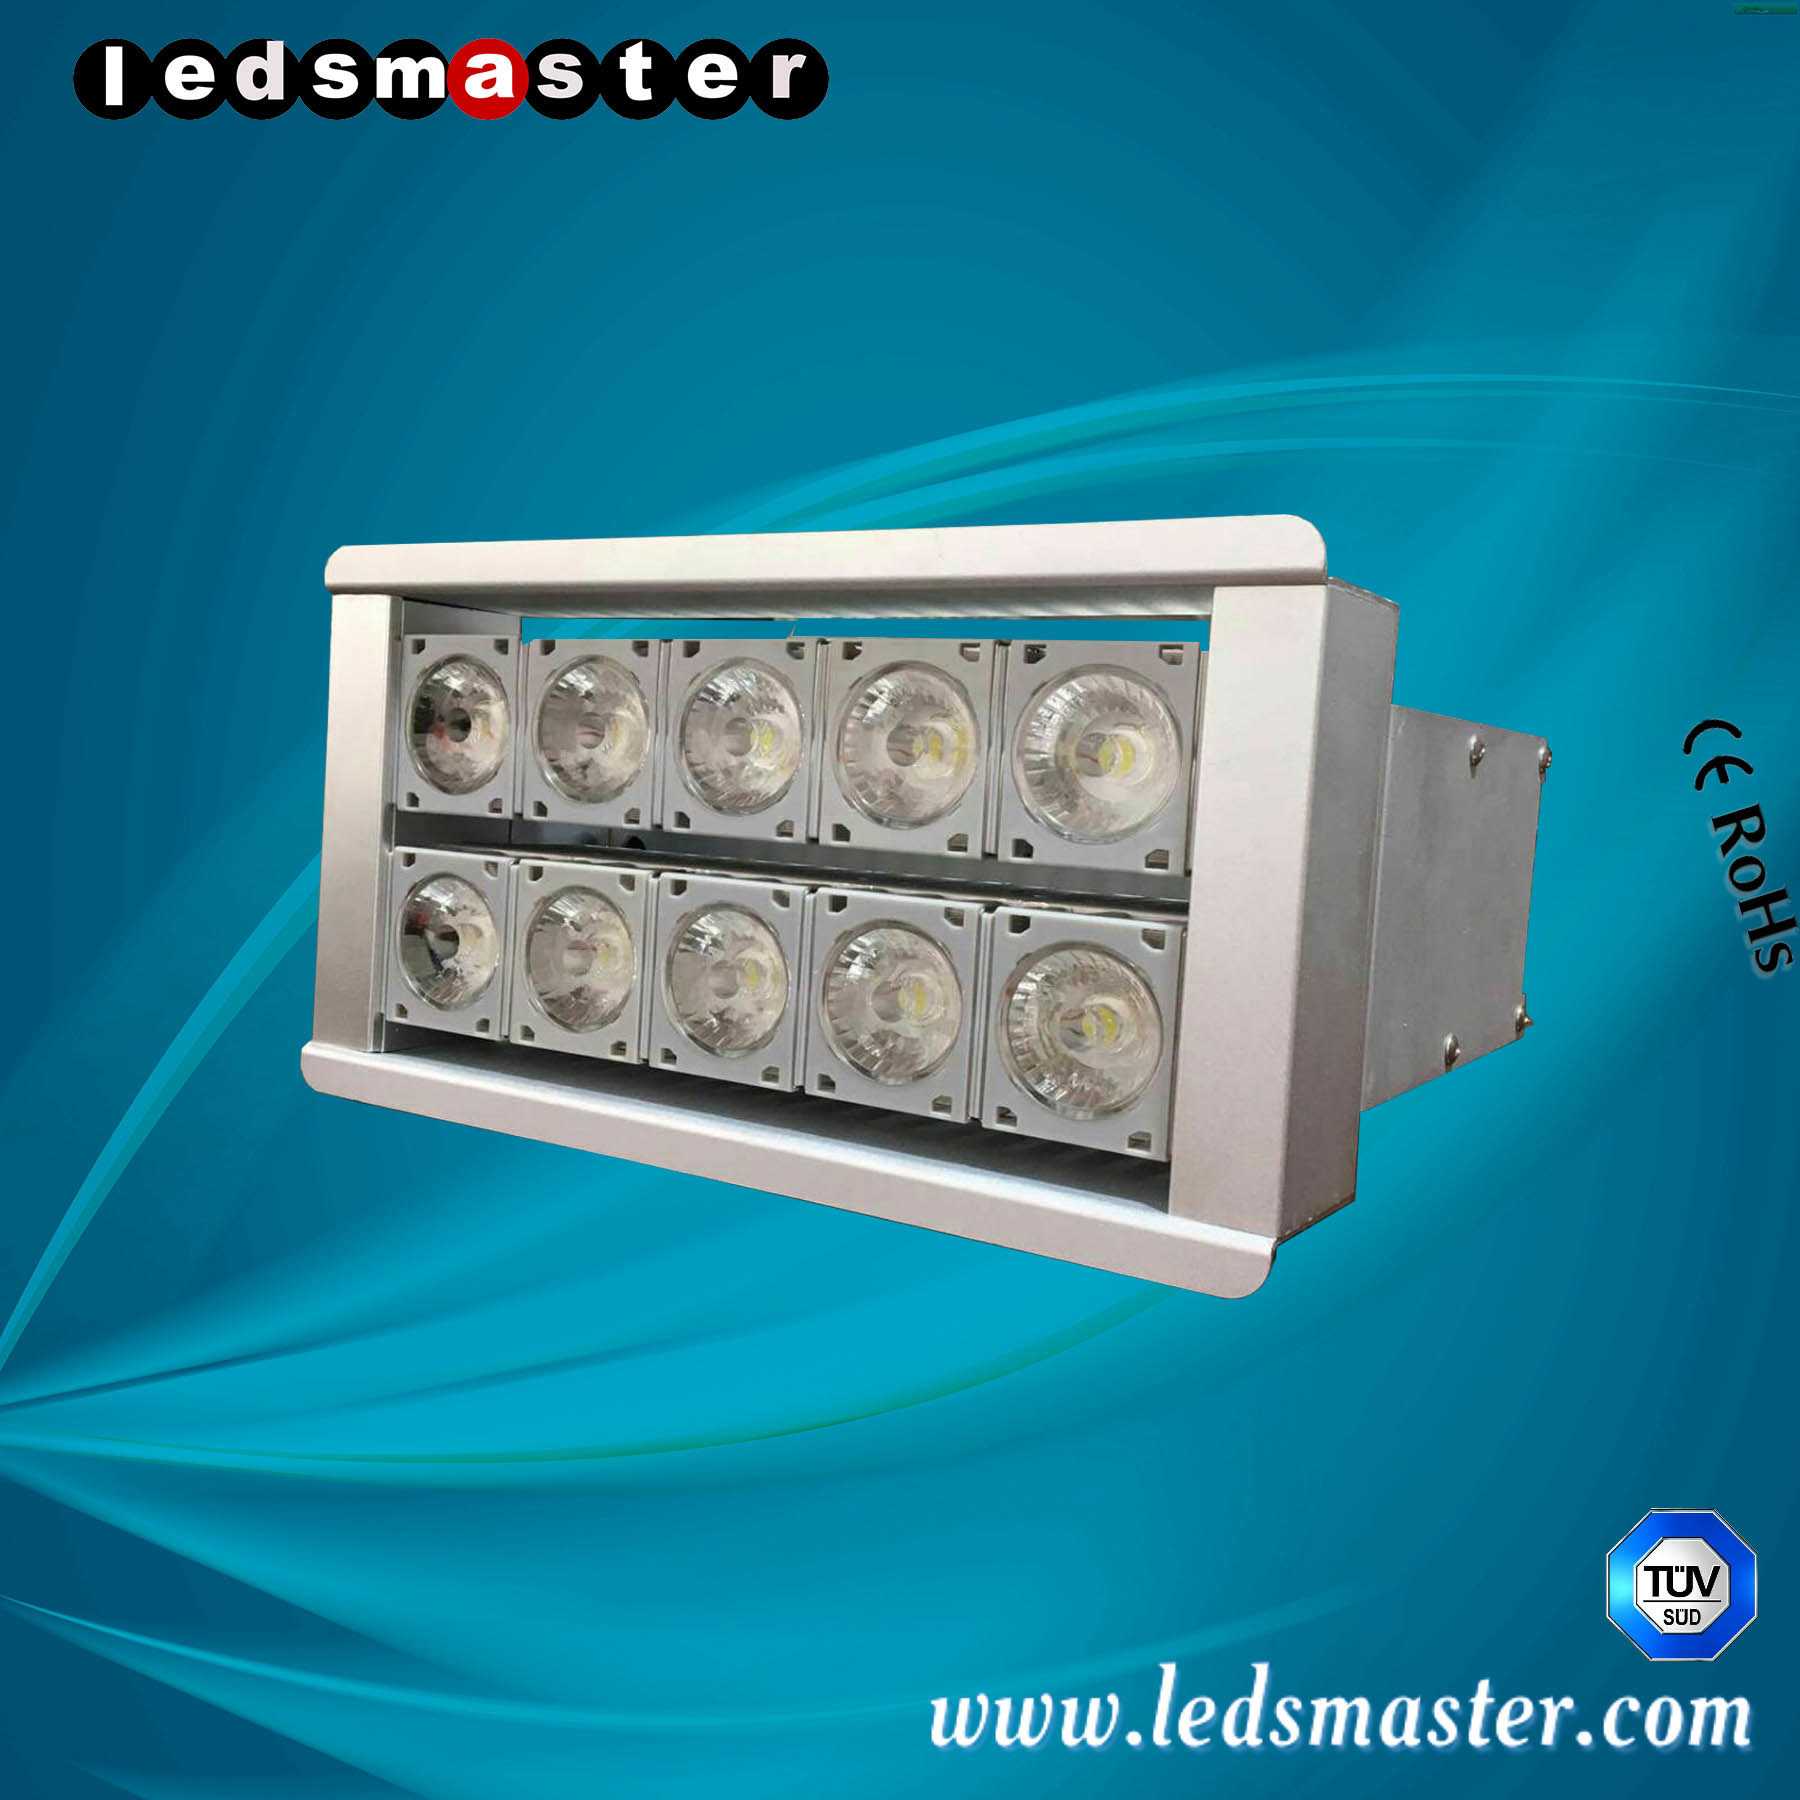 Factory Price 180lm/Watt LED High Bay Light 300W for Warehouse